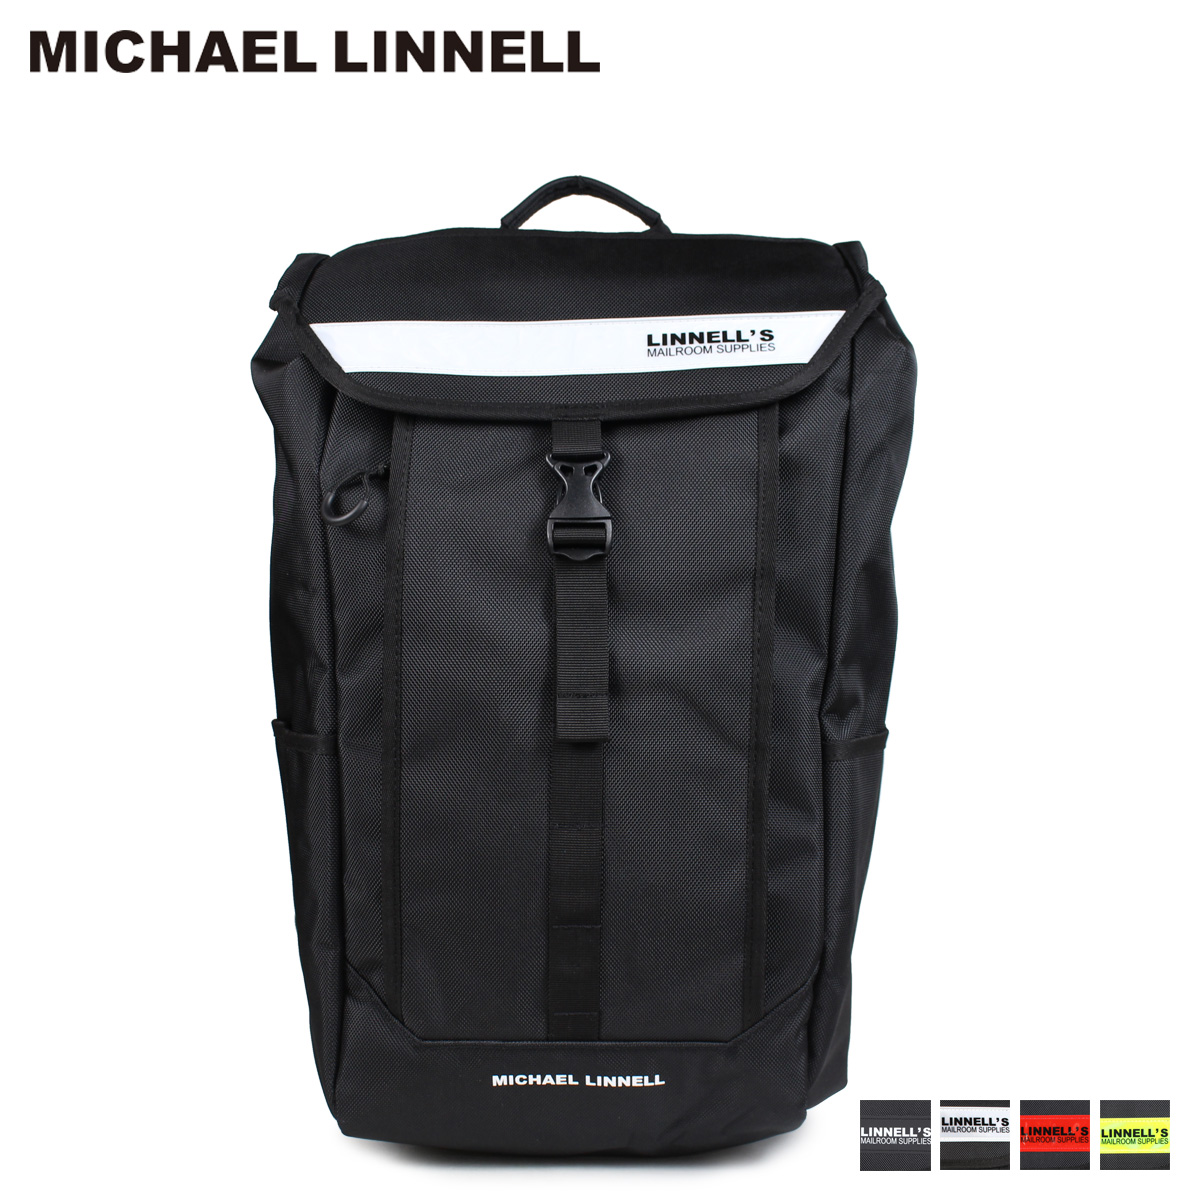 MICHAEL LINNELL BOX BACKPACK マイケルリンネル リュック バッグ 28L メンズ レディース バックパック ML-025 [予約商品 4/4頃入荷予定 追加入荷]